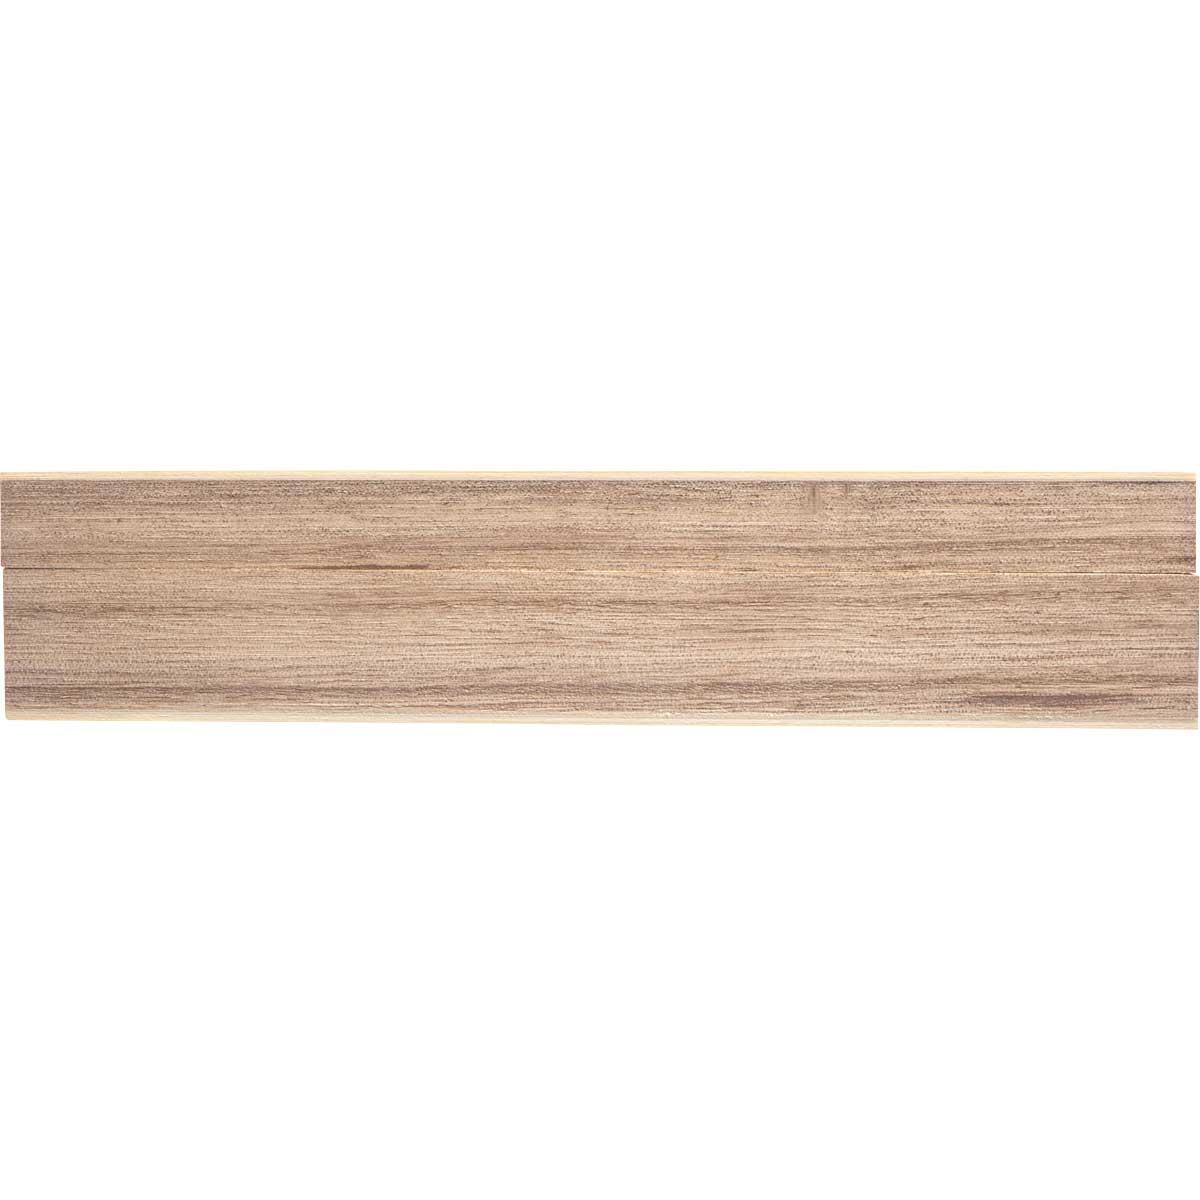 Plaid ® Wood Surfaces - Cigar Box